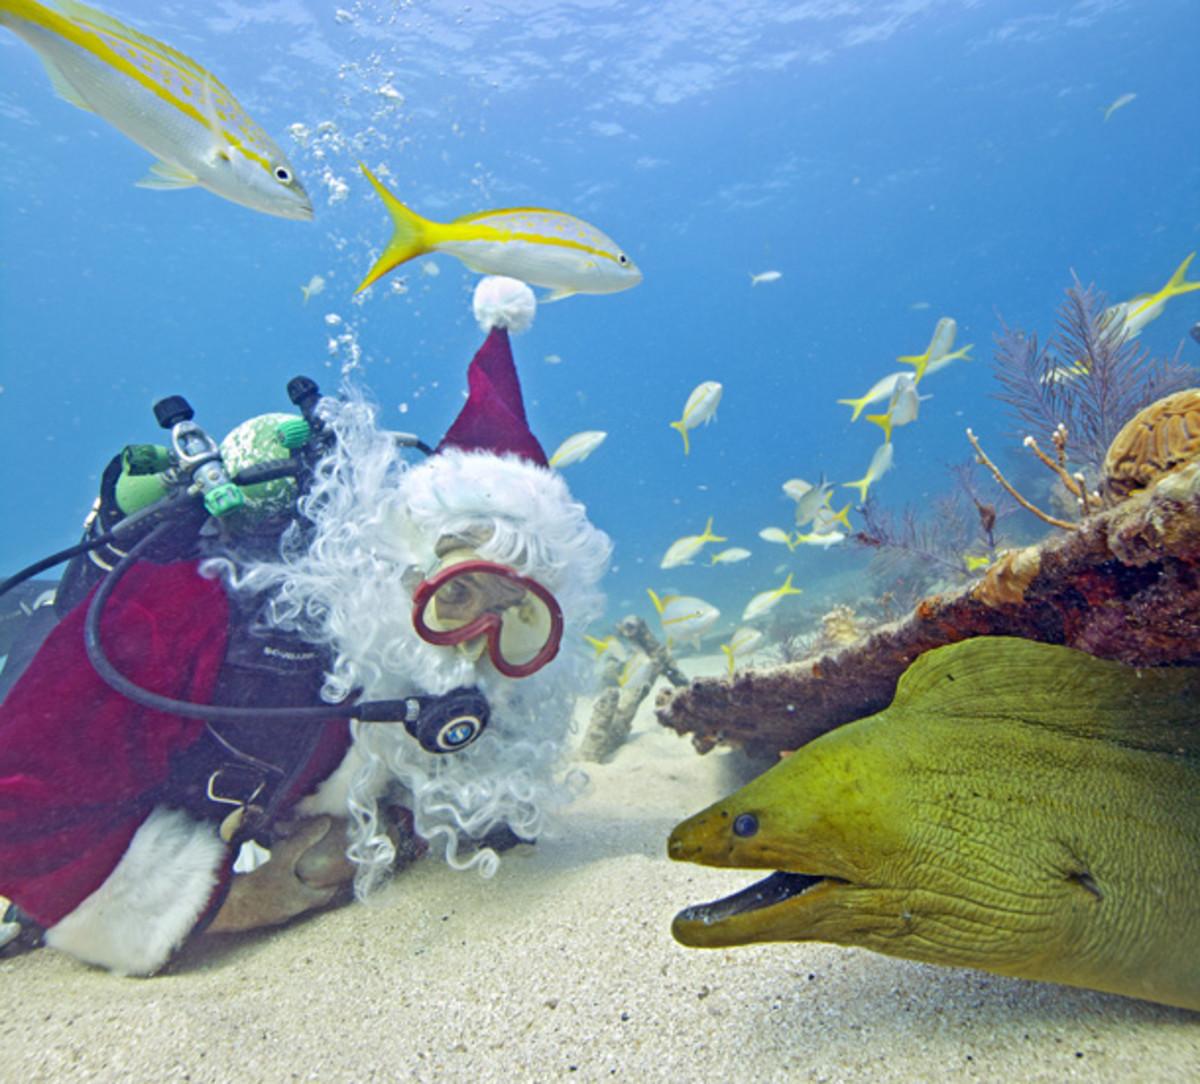 Scuba-diving Santa